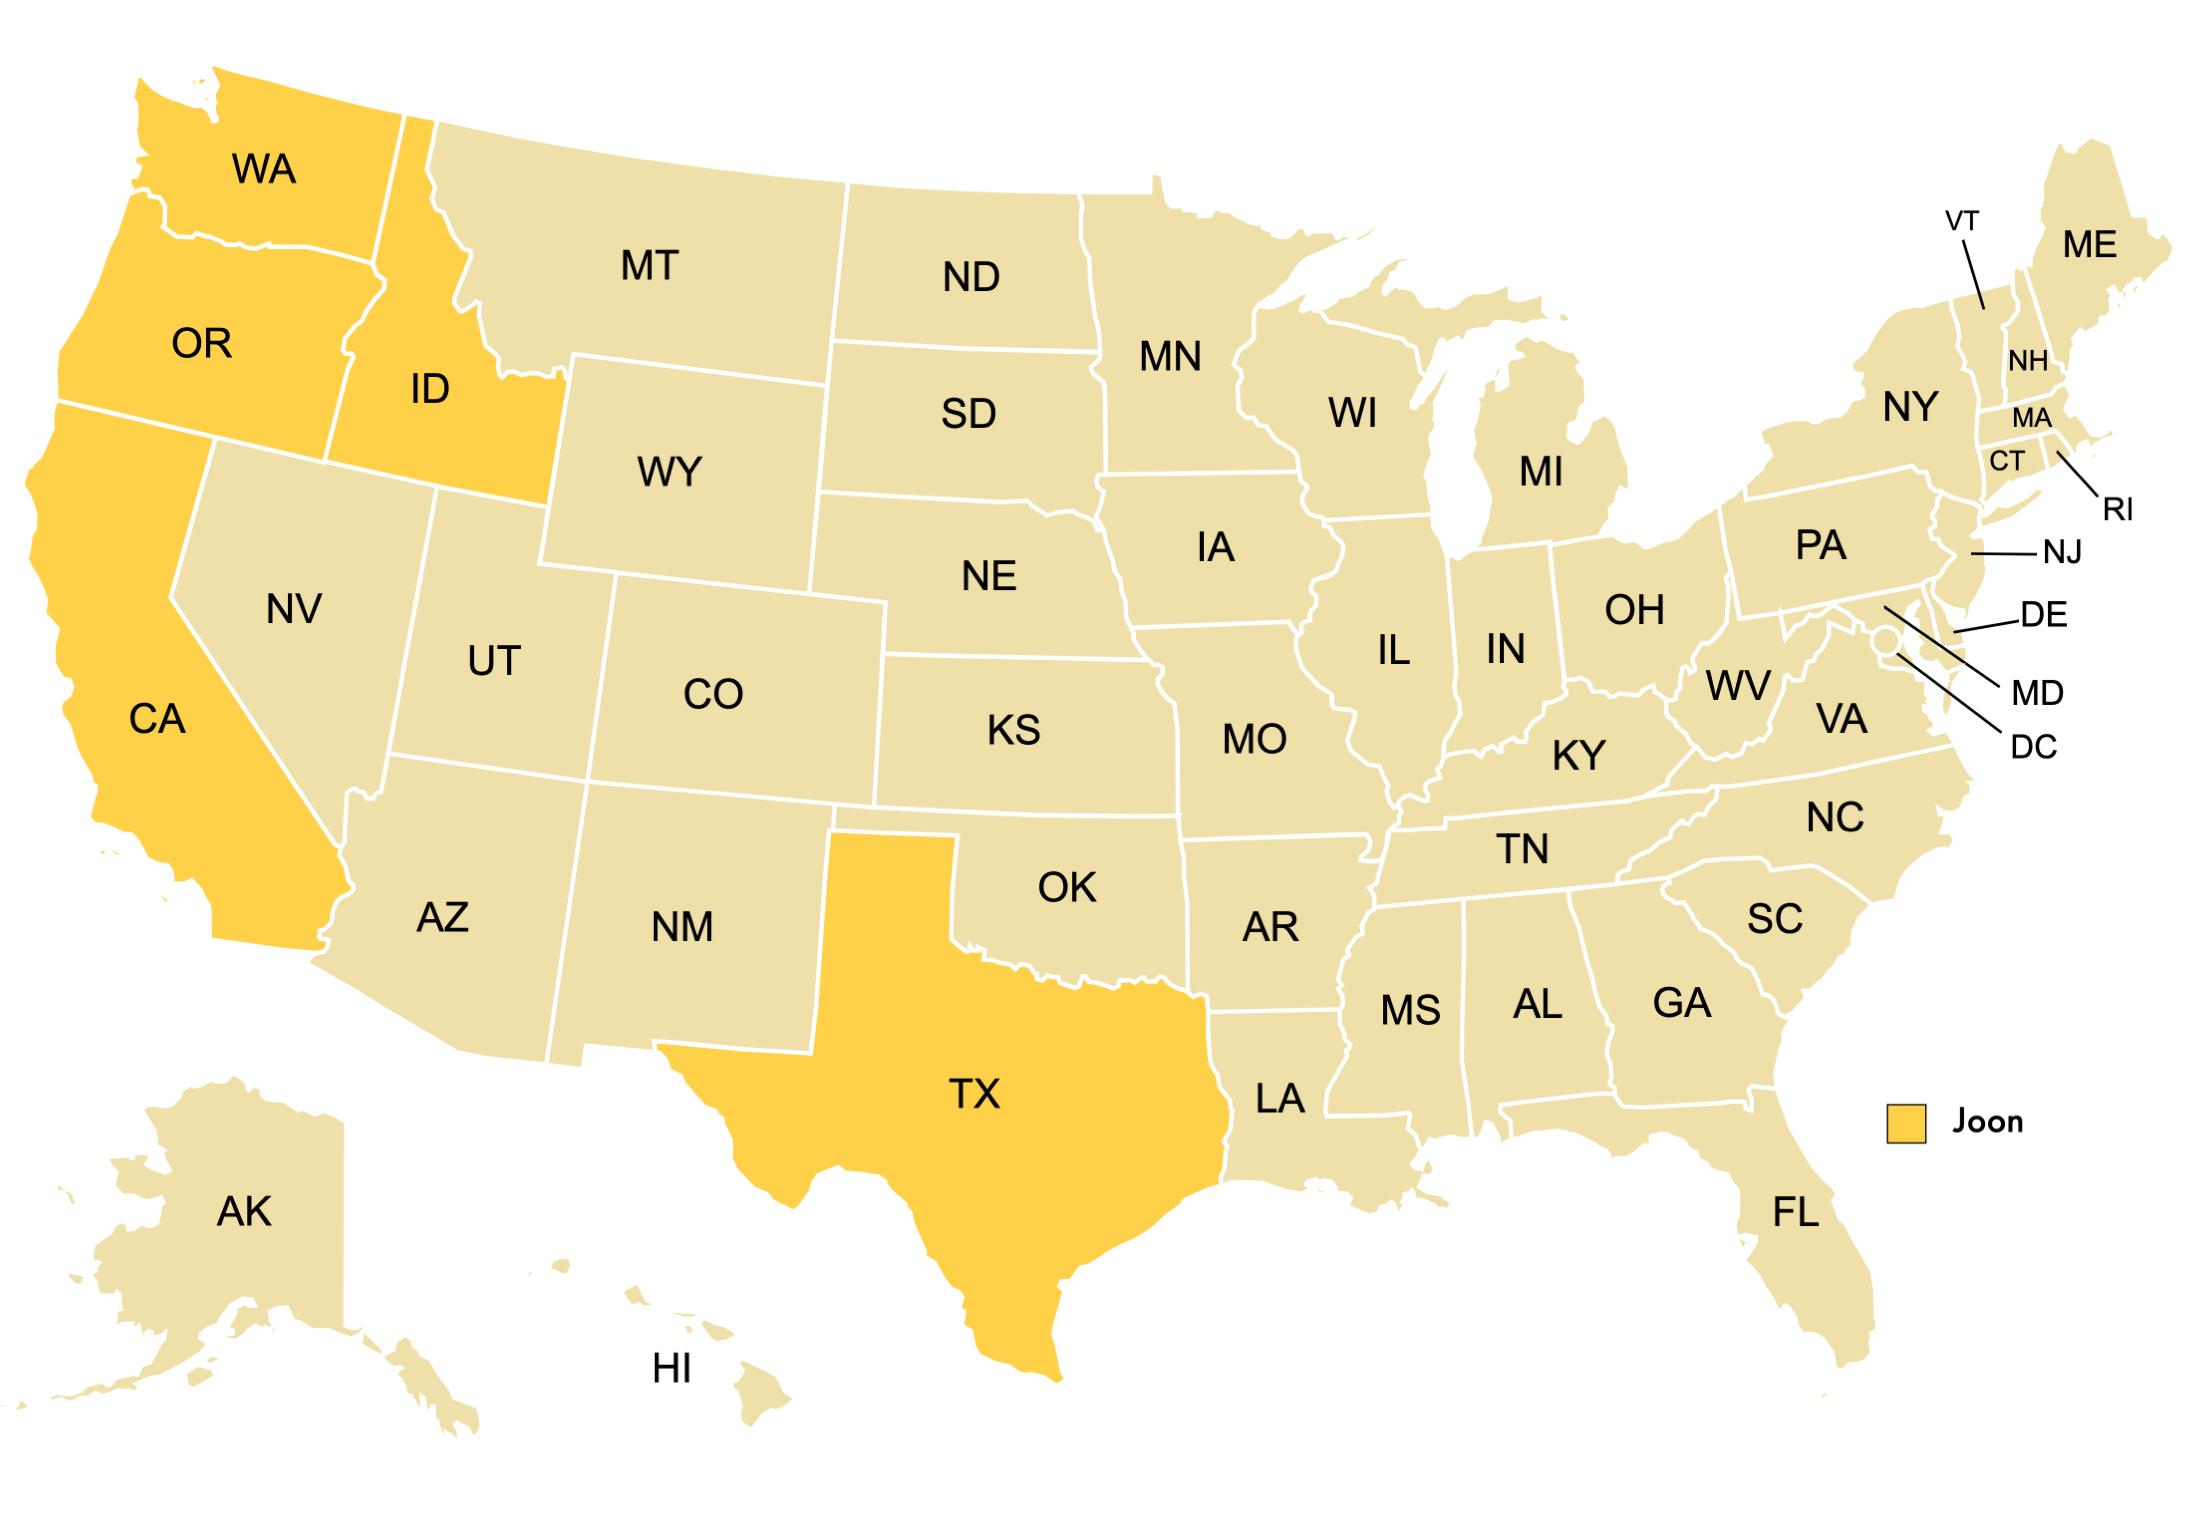 US states where Joon is available: Washington, Oregon, Idaho, California, and Texas.